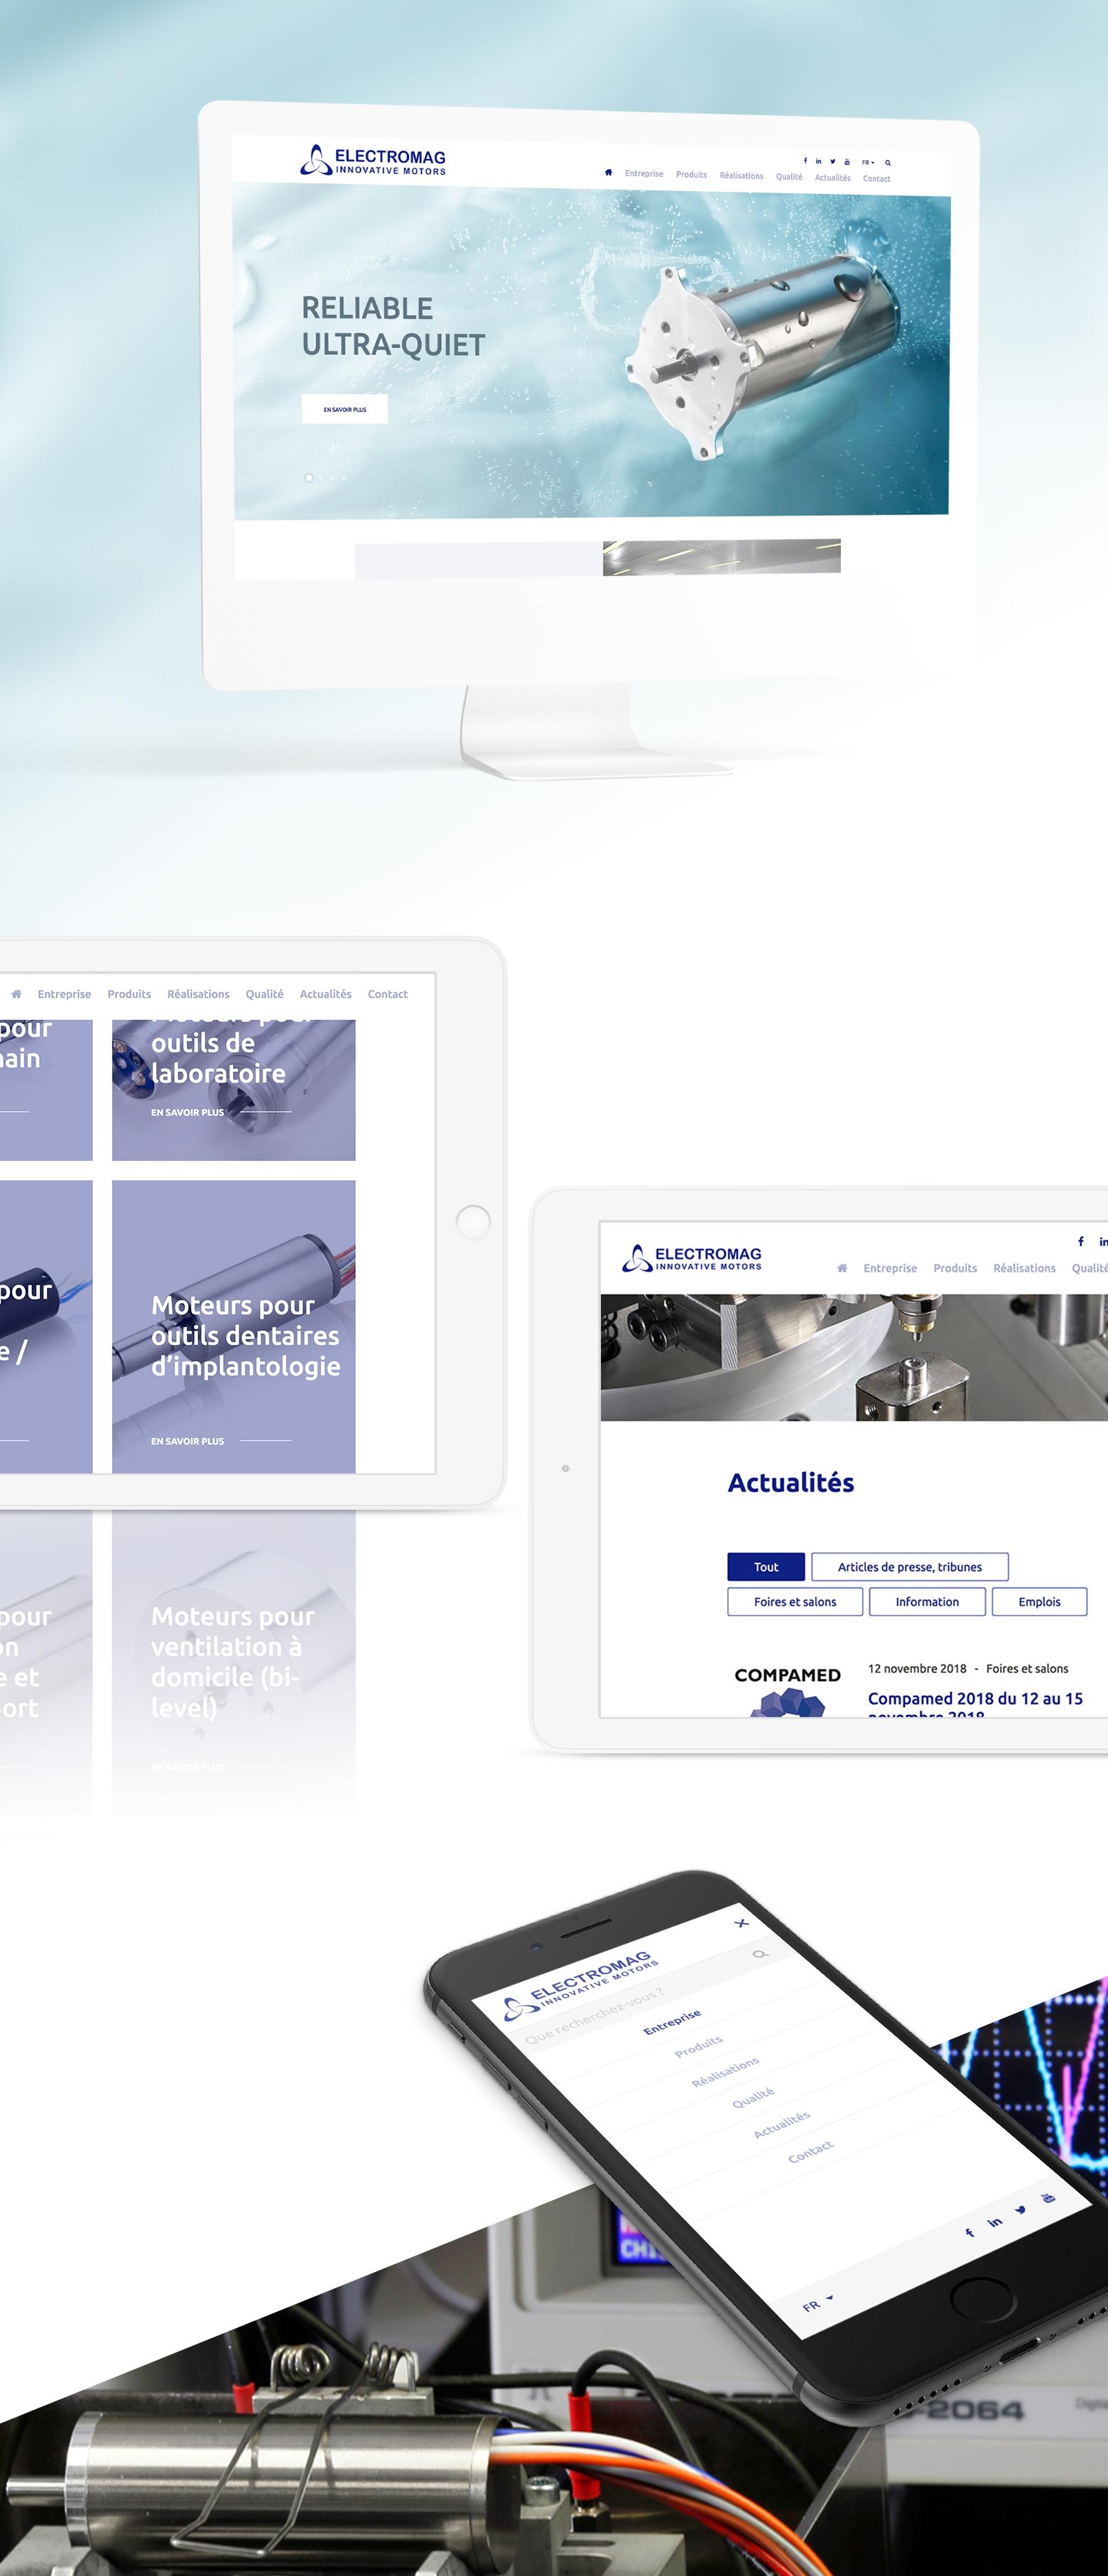 Electromag SA WNG Agence Digitale